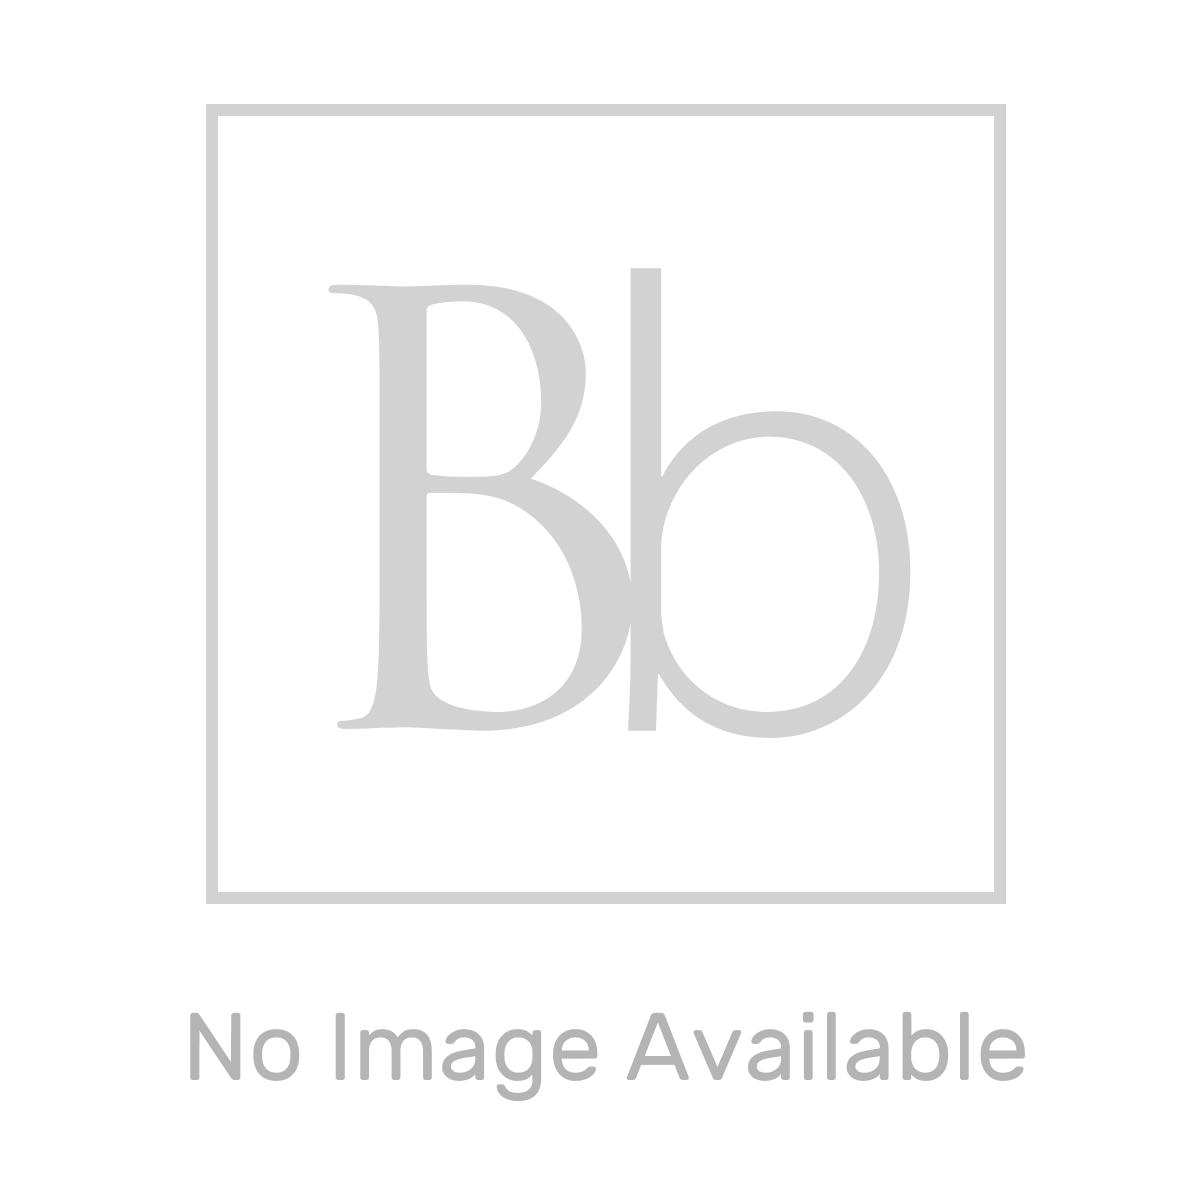 Frontline Chrome Vivid 4 Light Spotlight Bar 600mm Line Drawing